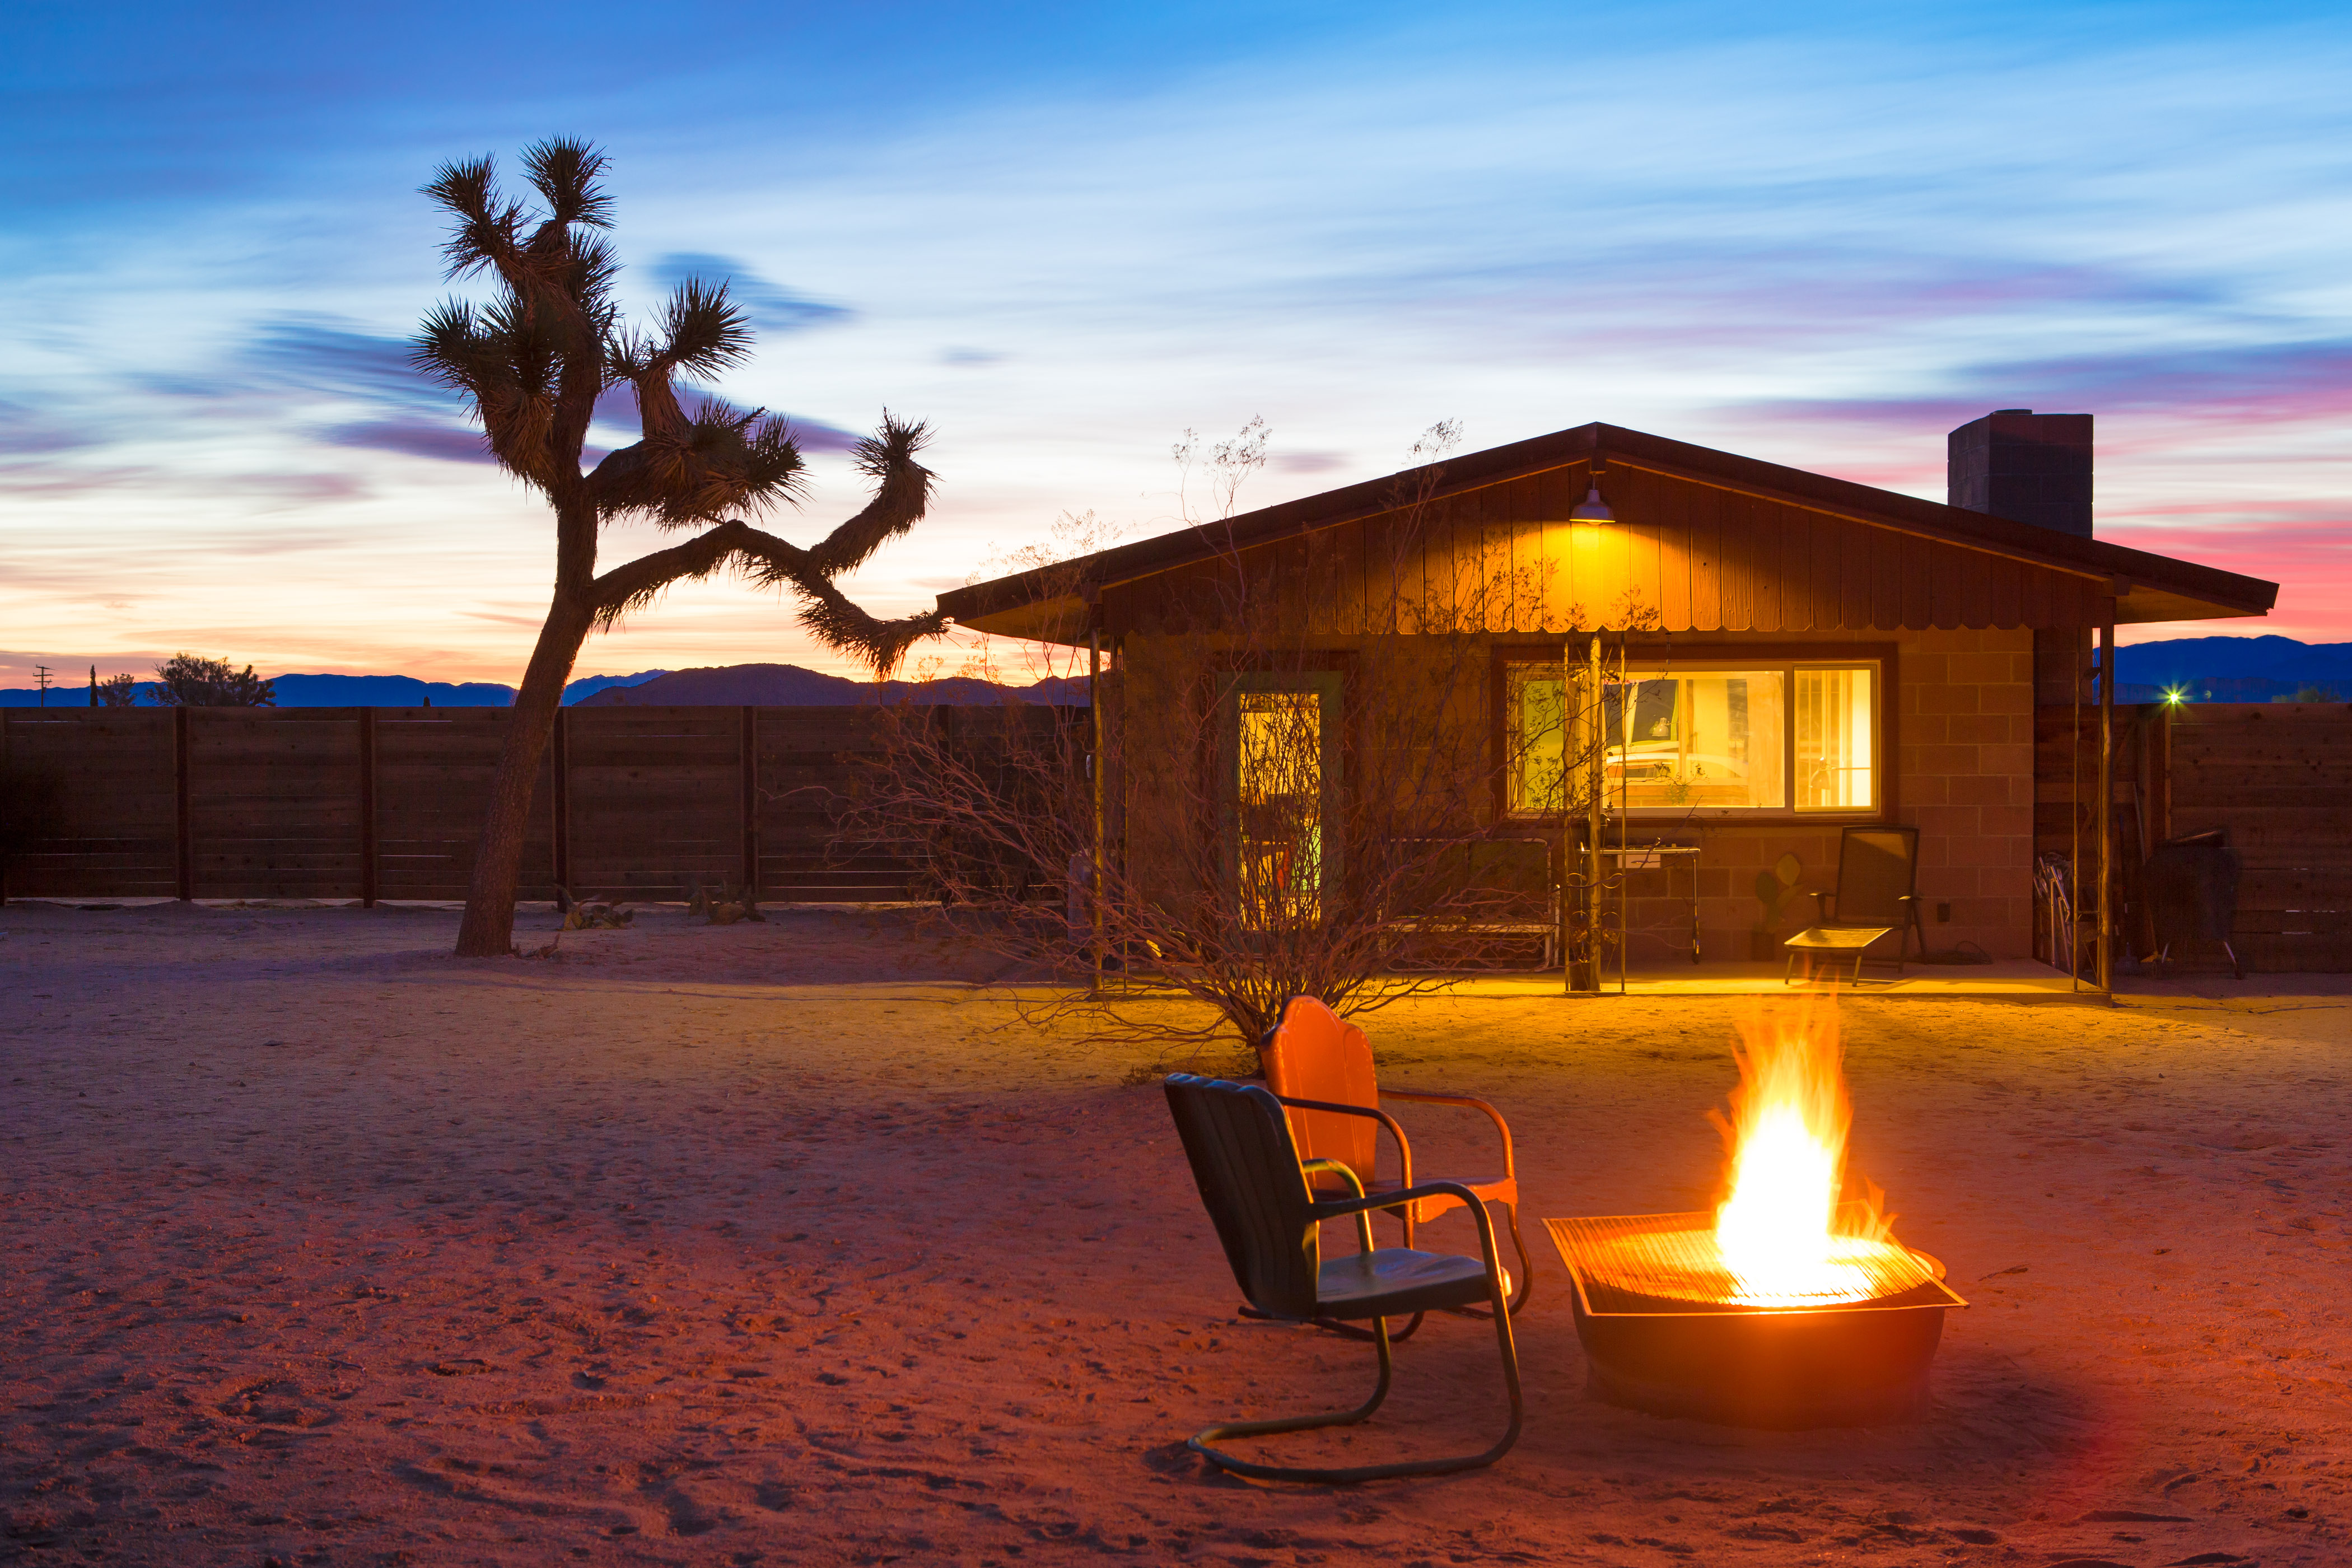 Joshua Tree 1954 Homestead Cabin Cabins For Rent In Joshua Tree California United States